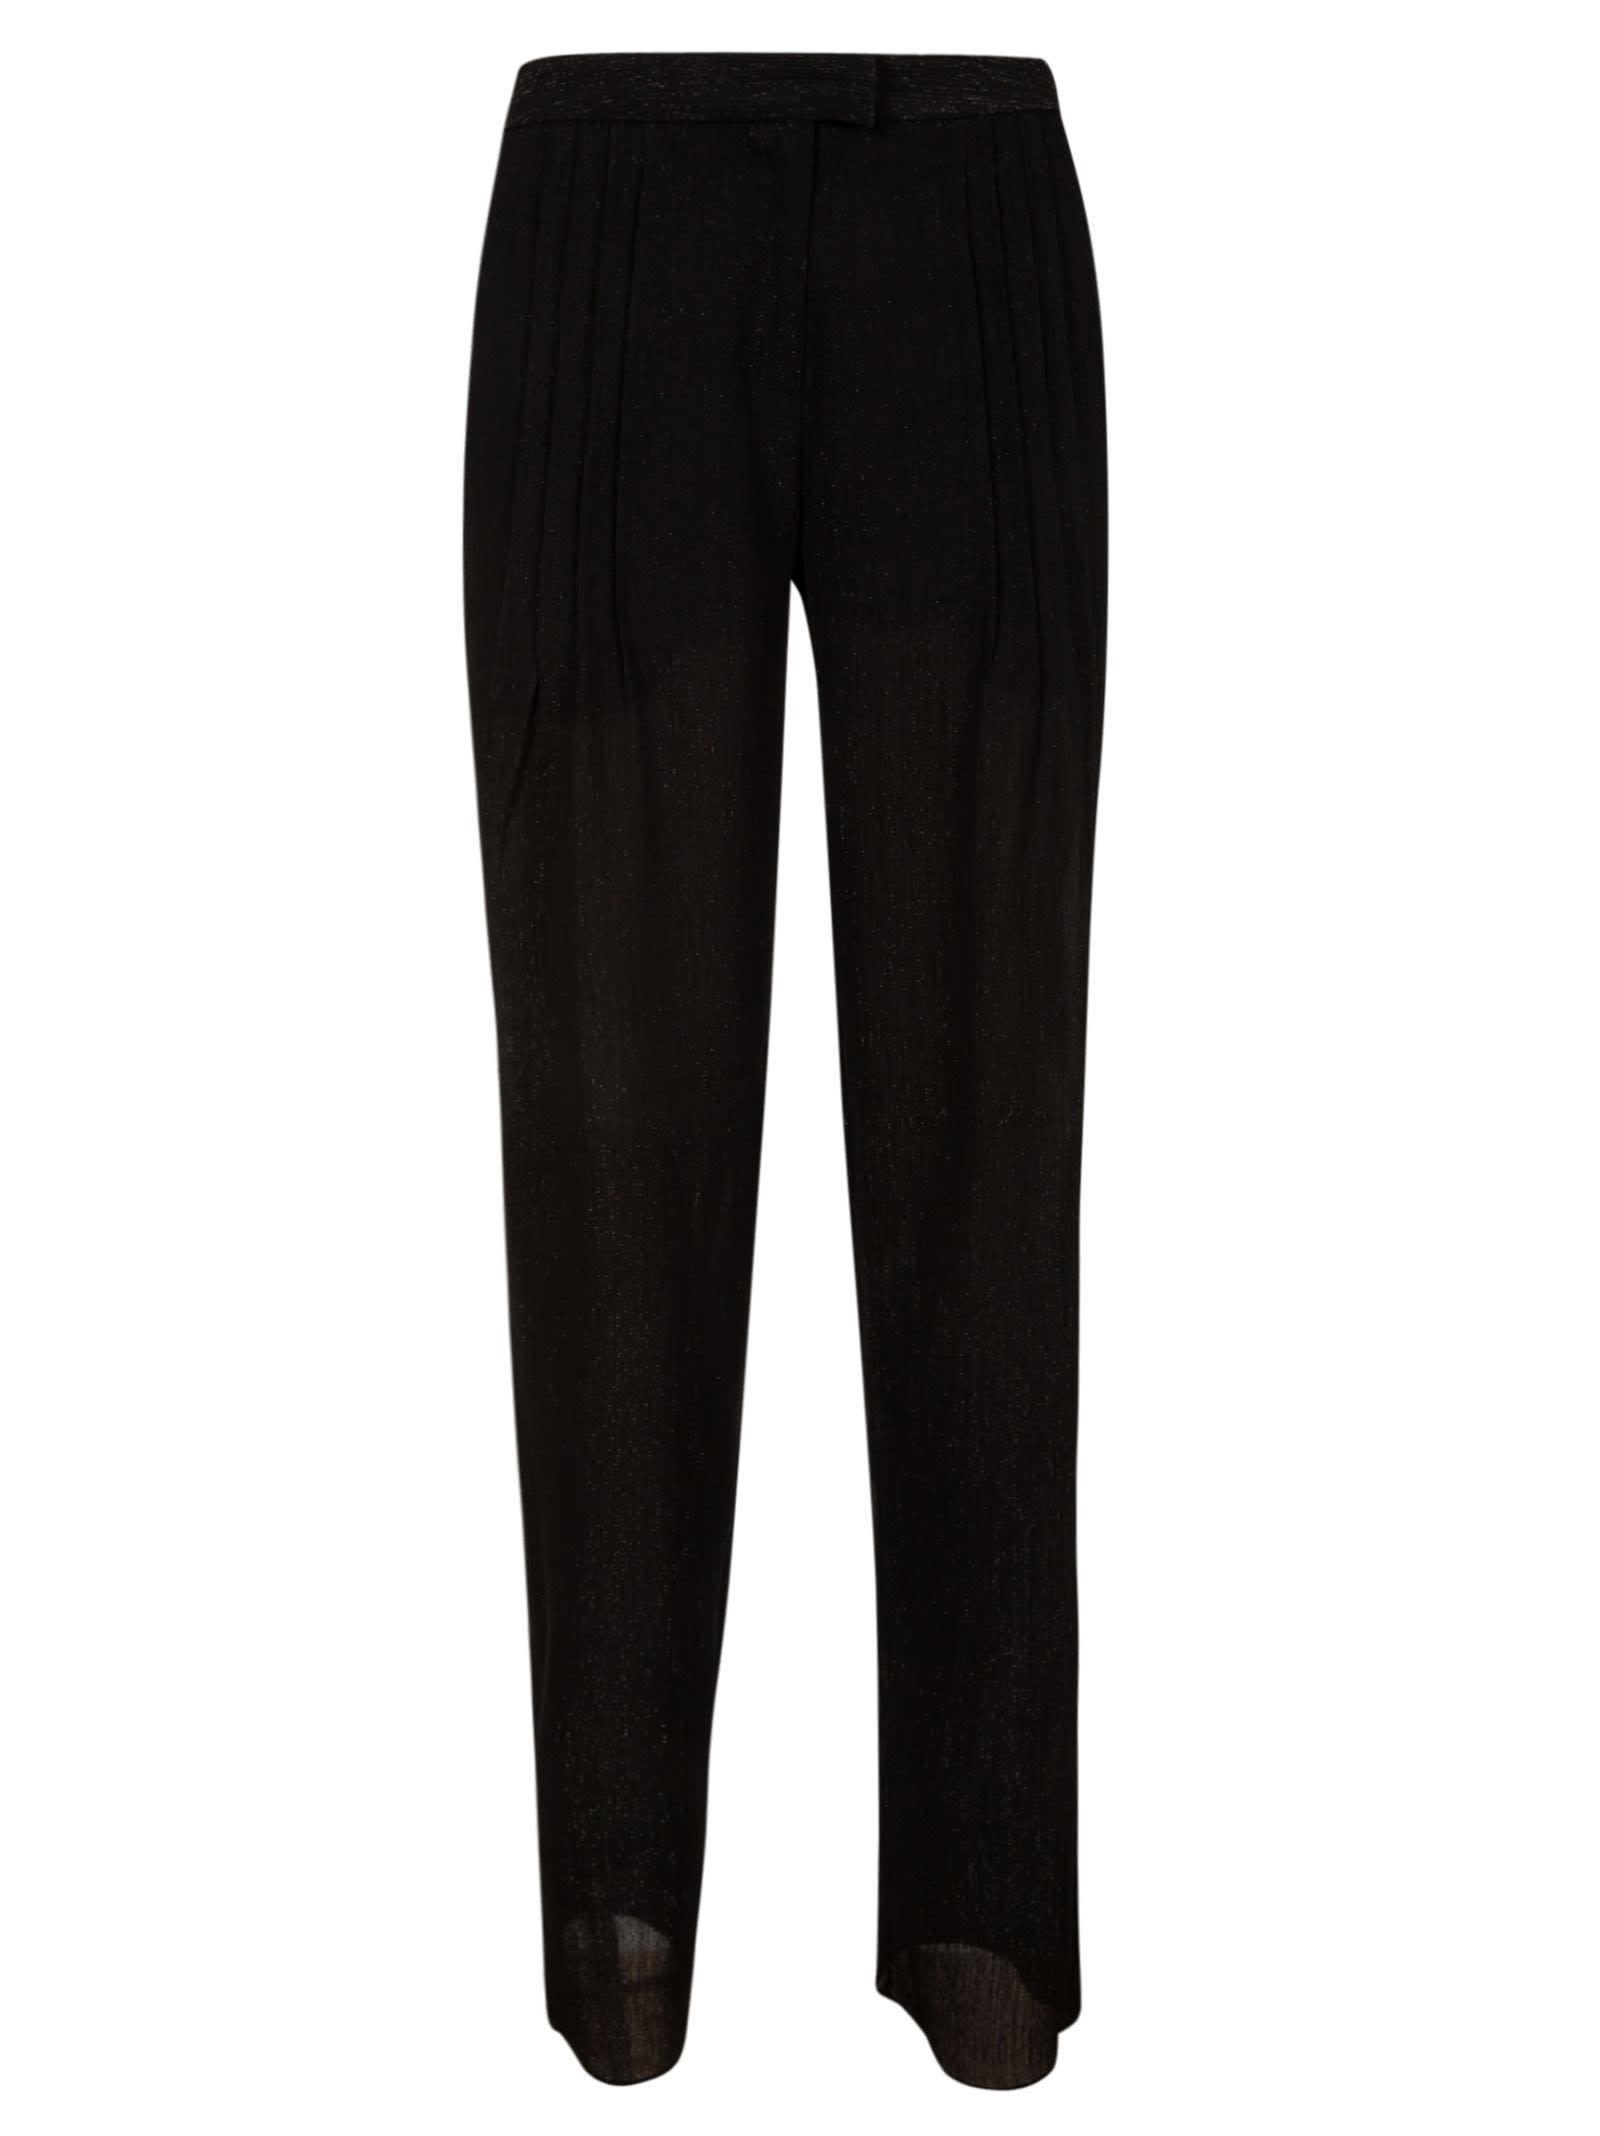 Emporio Armani Side Pleated Trousers